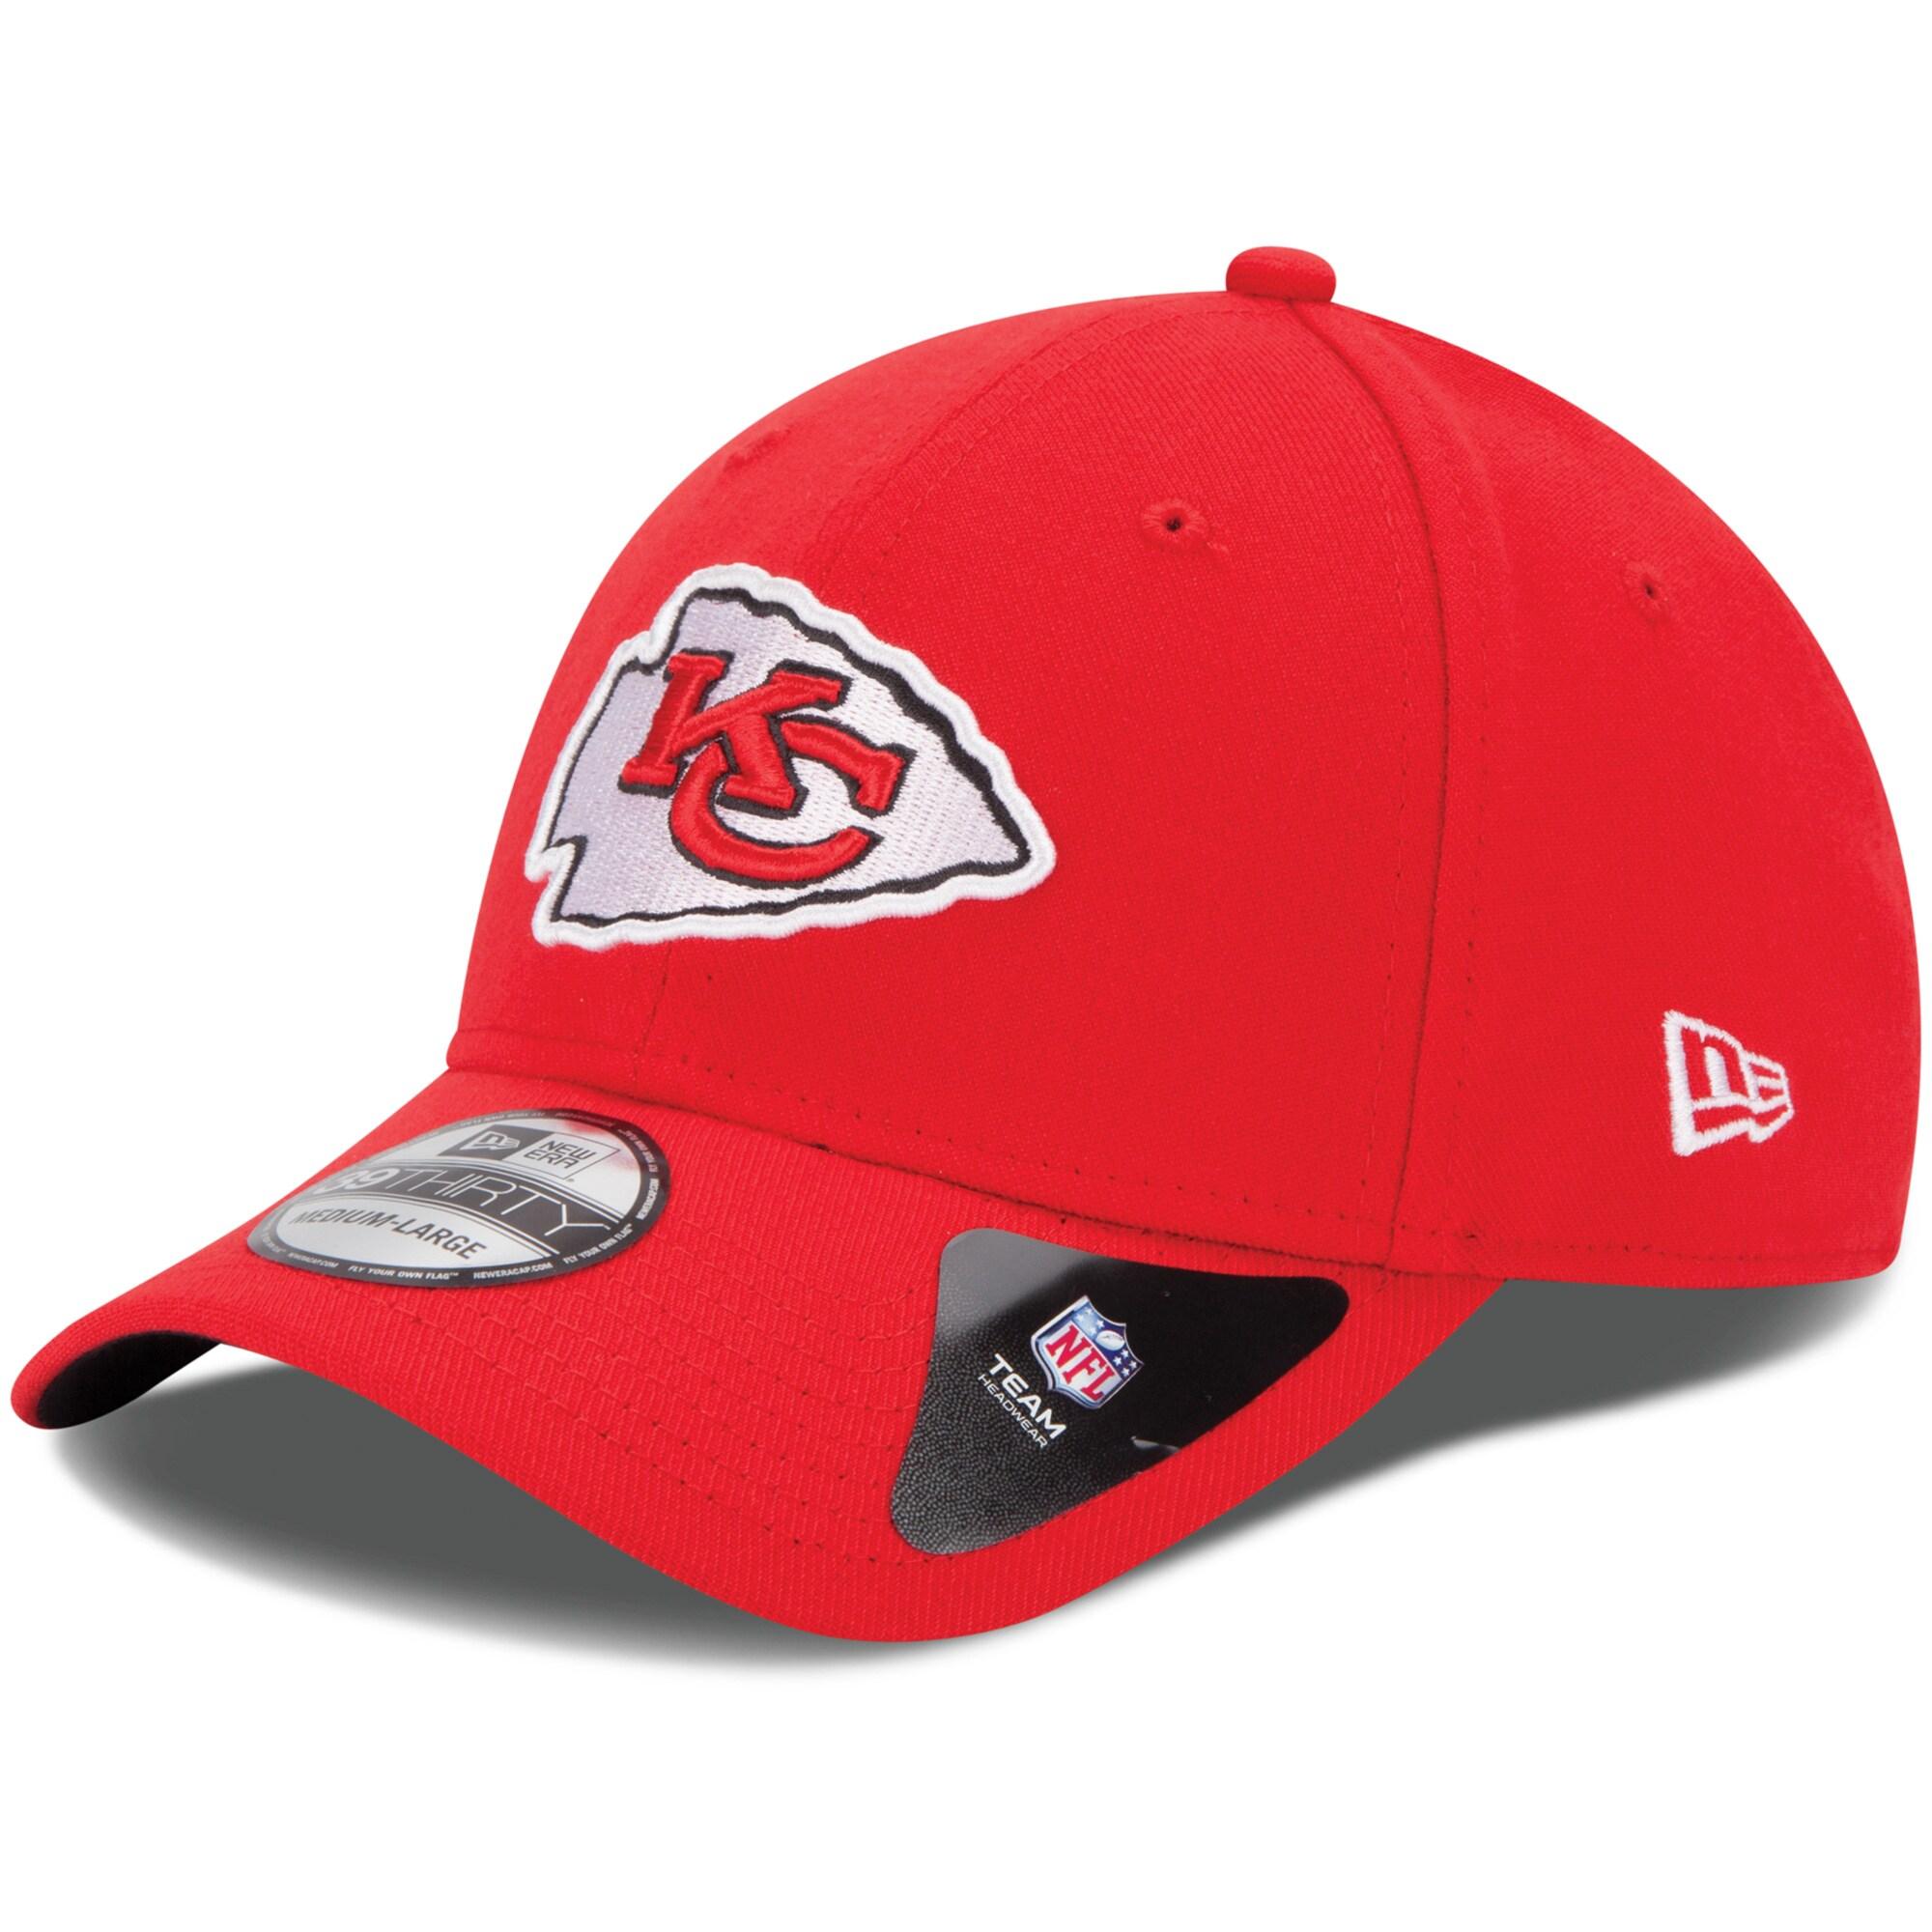 Kansas City Chiefs New Era Youth Team Classic 39THIRTY Flex Hat - Red